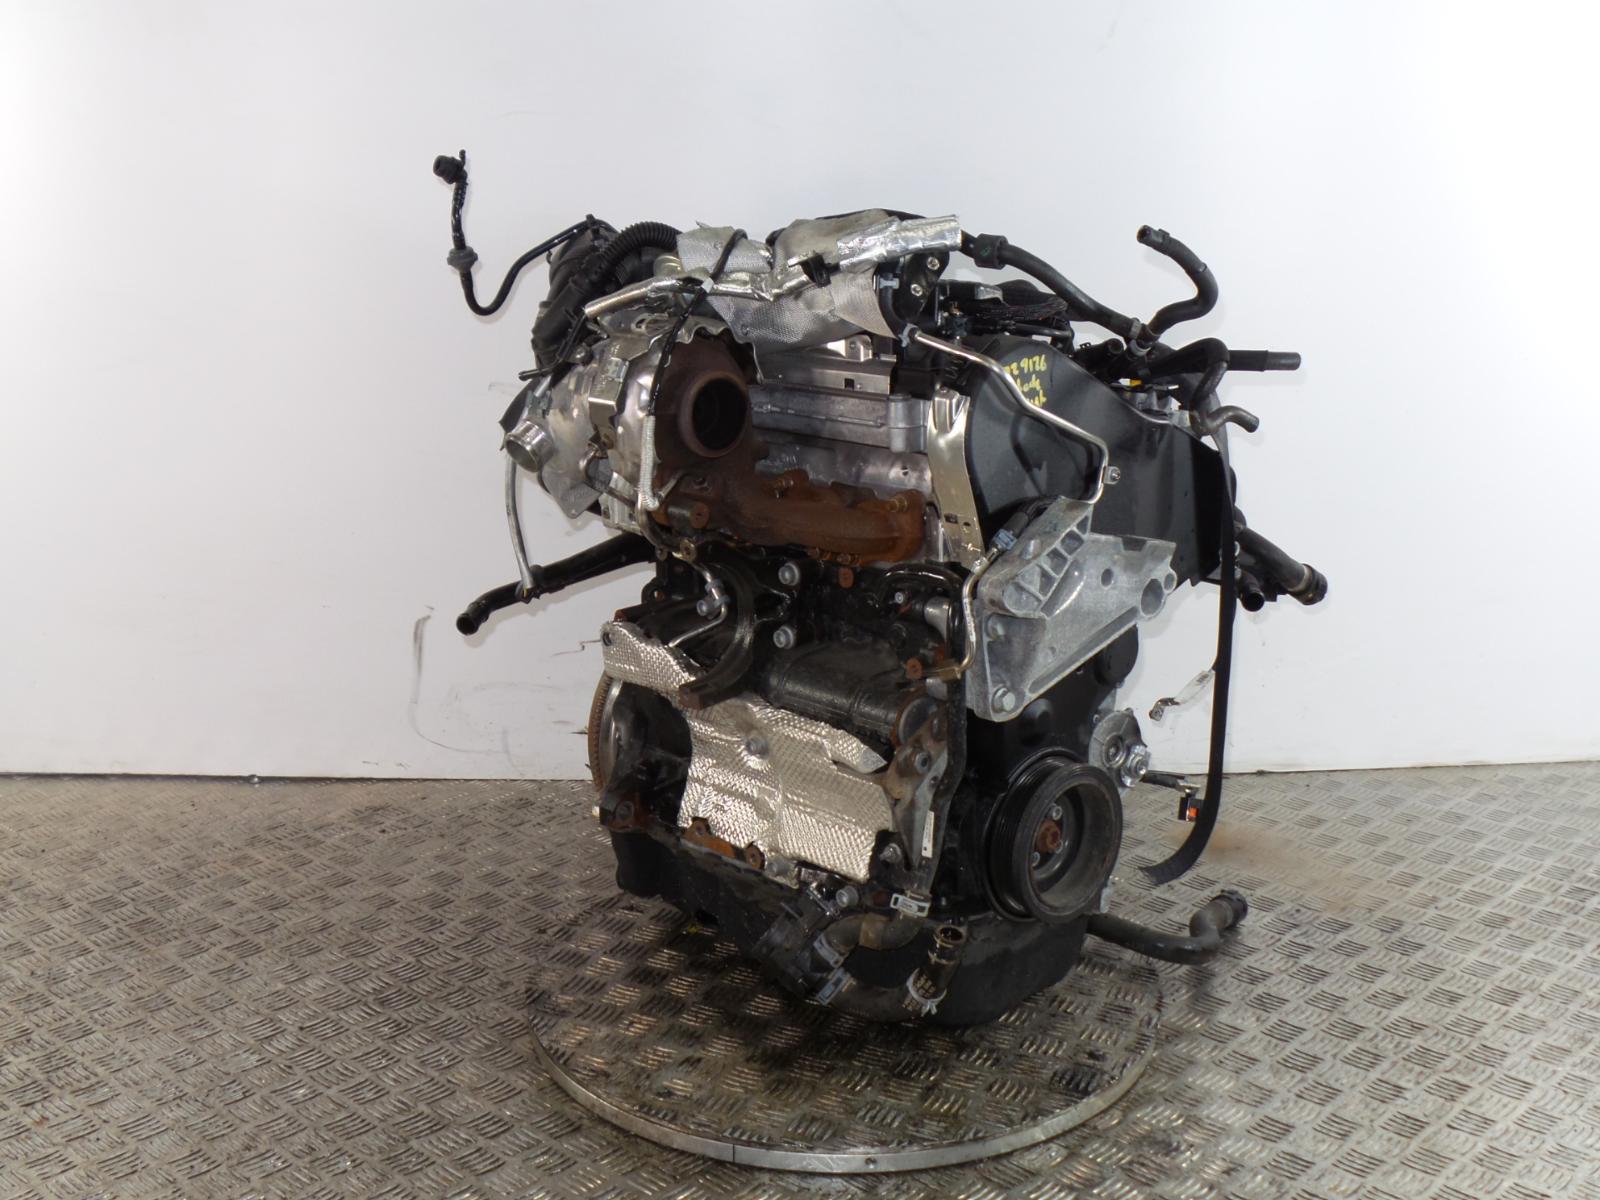 2013 VOLKSWAGEN GOLF 2 0 Diesel TDI CR Engine 04L100031 CRBC